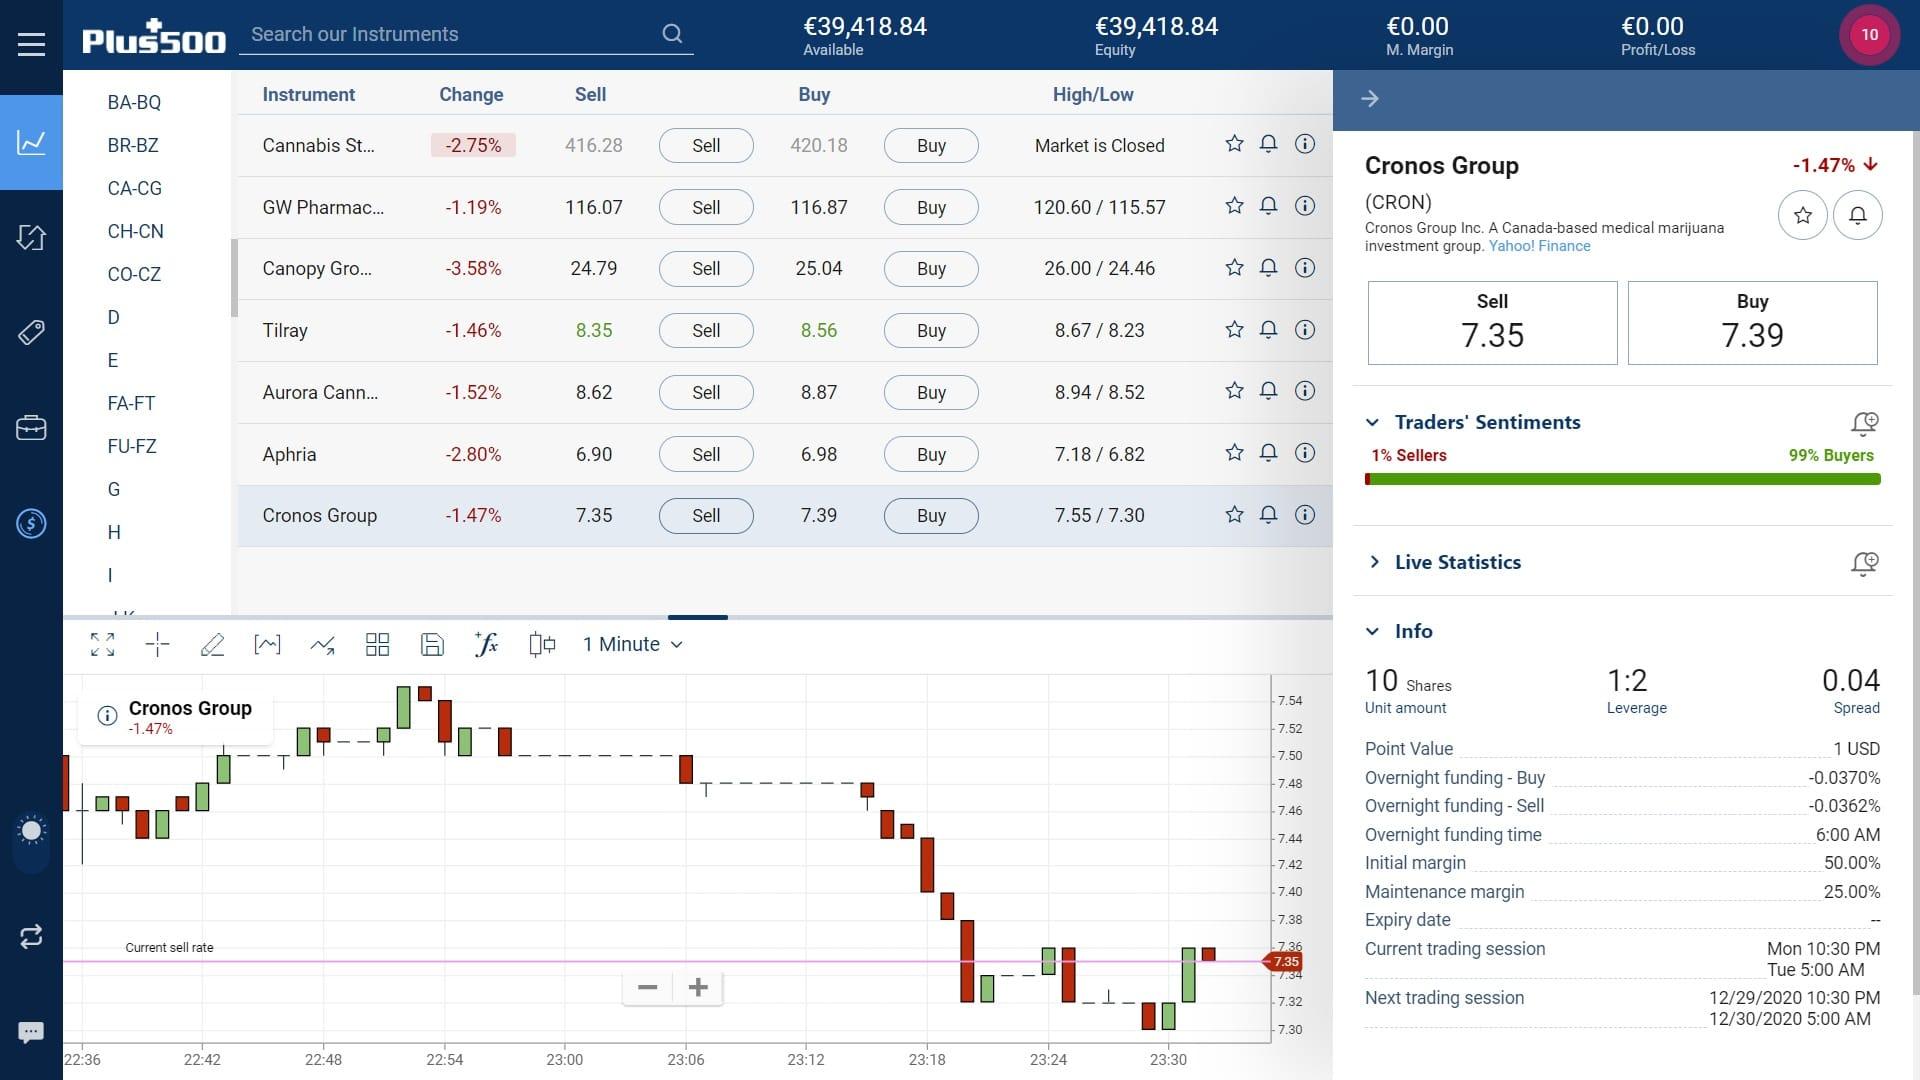 Cronos stock trading on Plus500's WebTrader platform